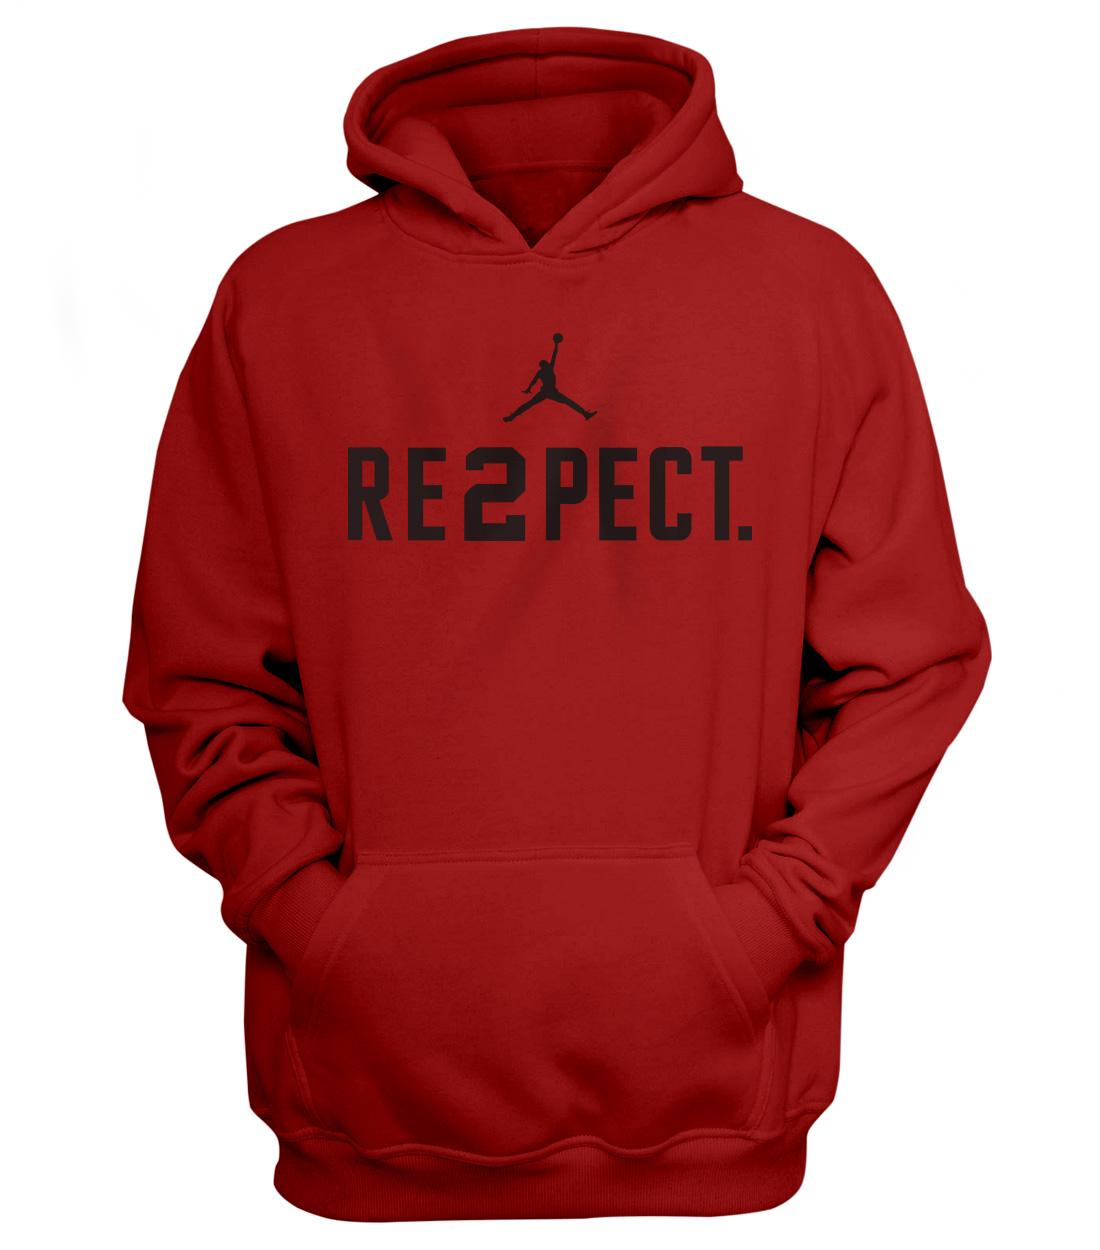 RE2PECT. HOODIE (HD-RED-NP-112-Respect-Siyah)